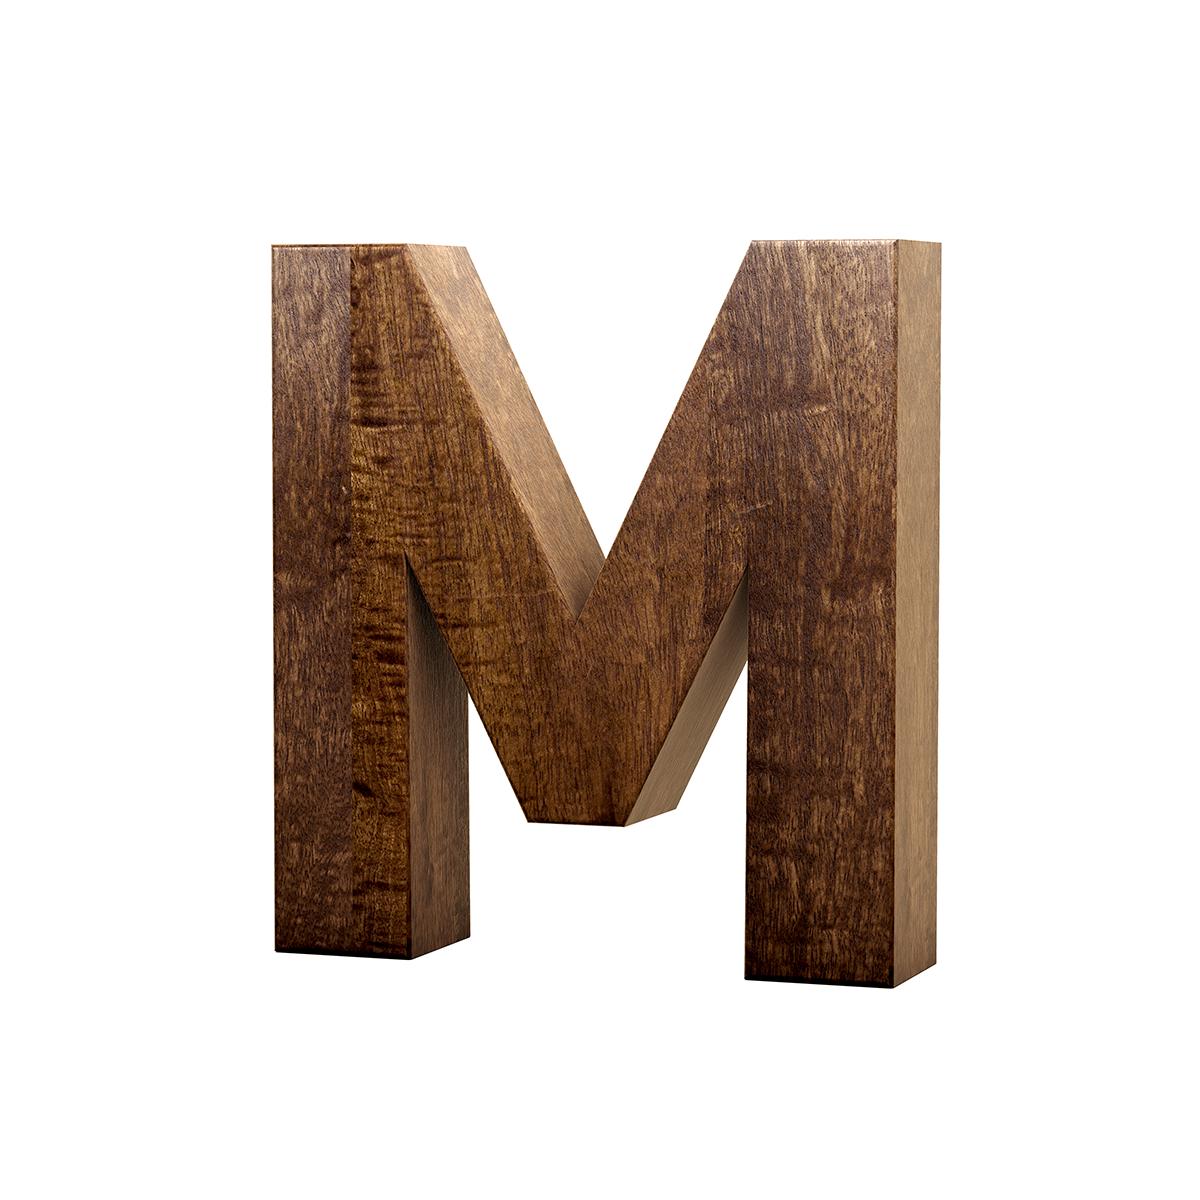 https://smyrnovleather.com/wp-content/uploads/2017/05/product_01.png